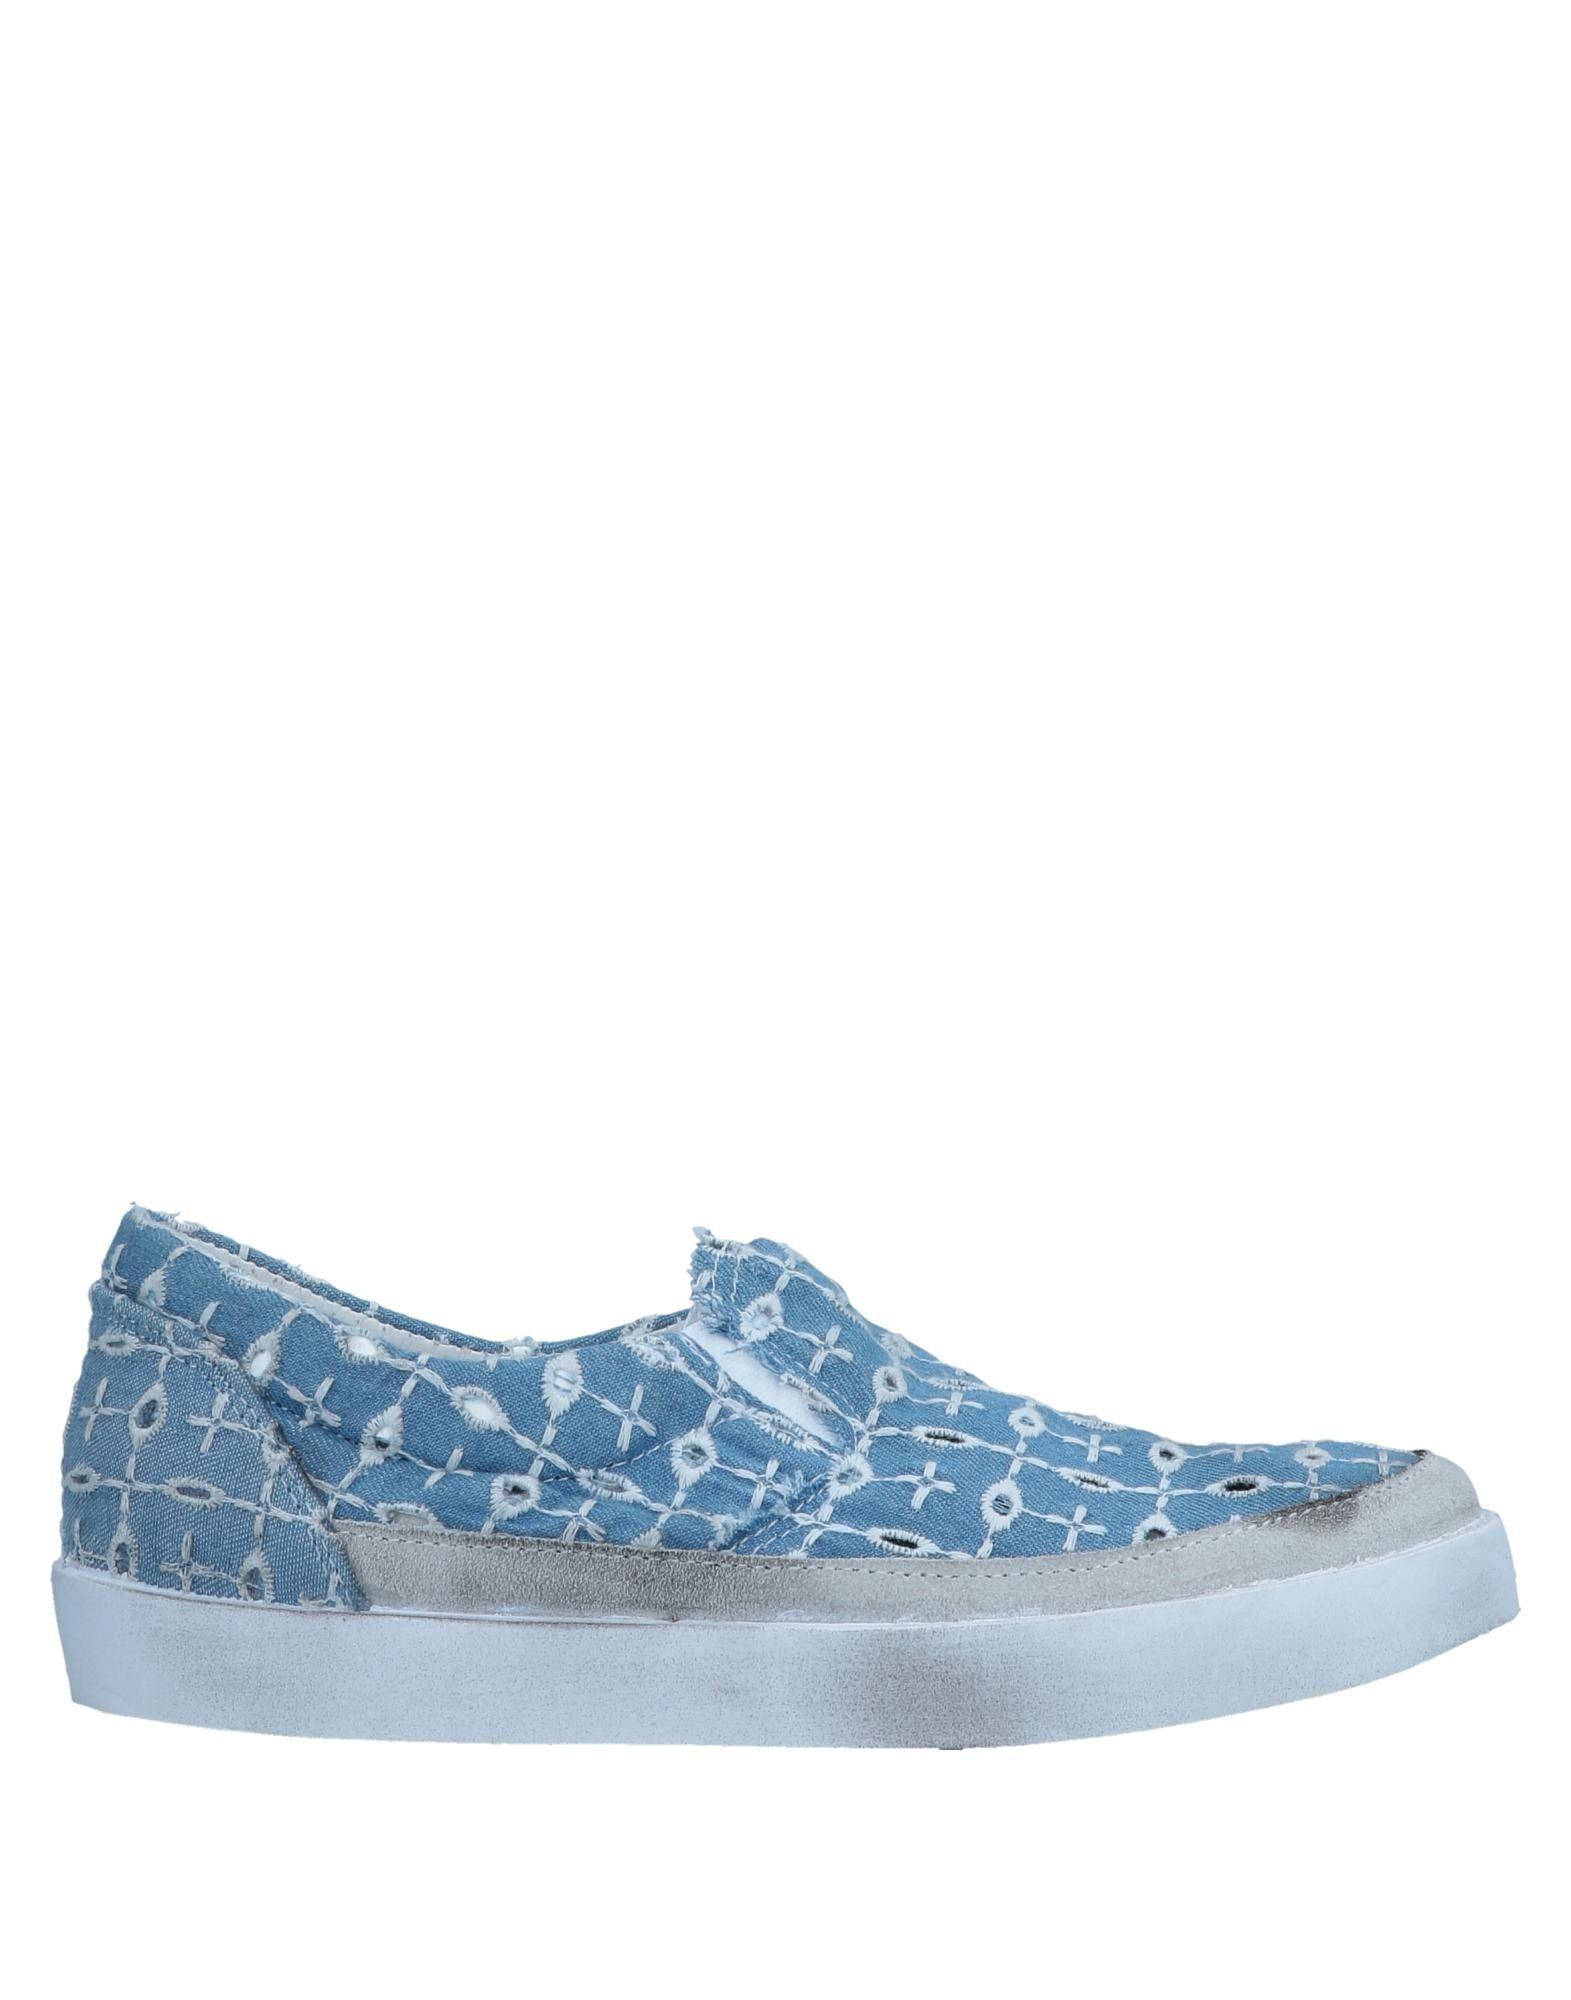 2Star Sneakers - on Women 2Star Sneakers online on -  Canada - 11547659EJ 3f3e1e